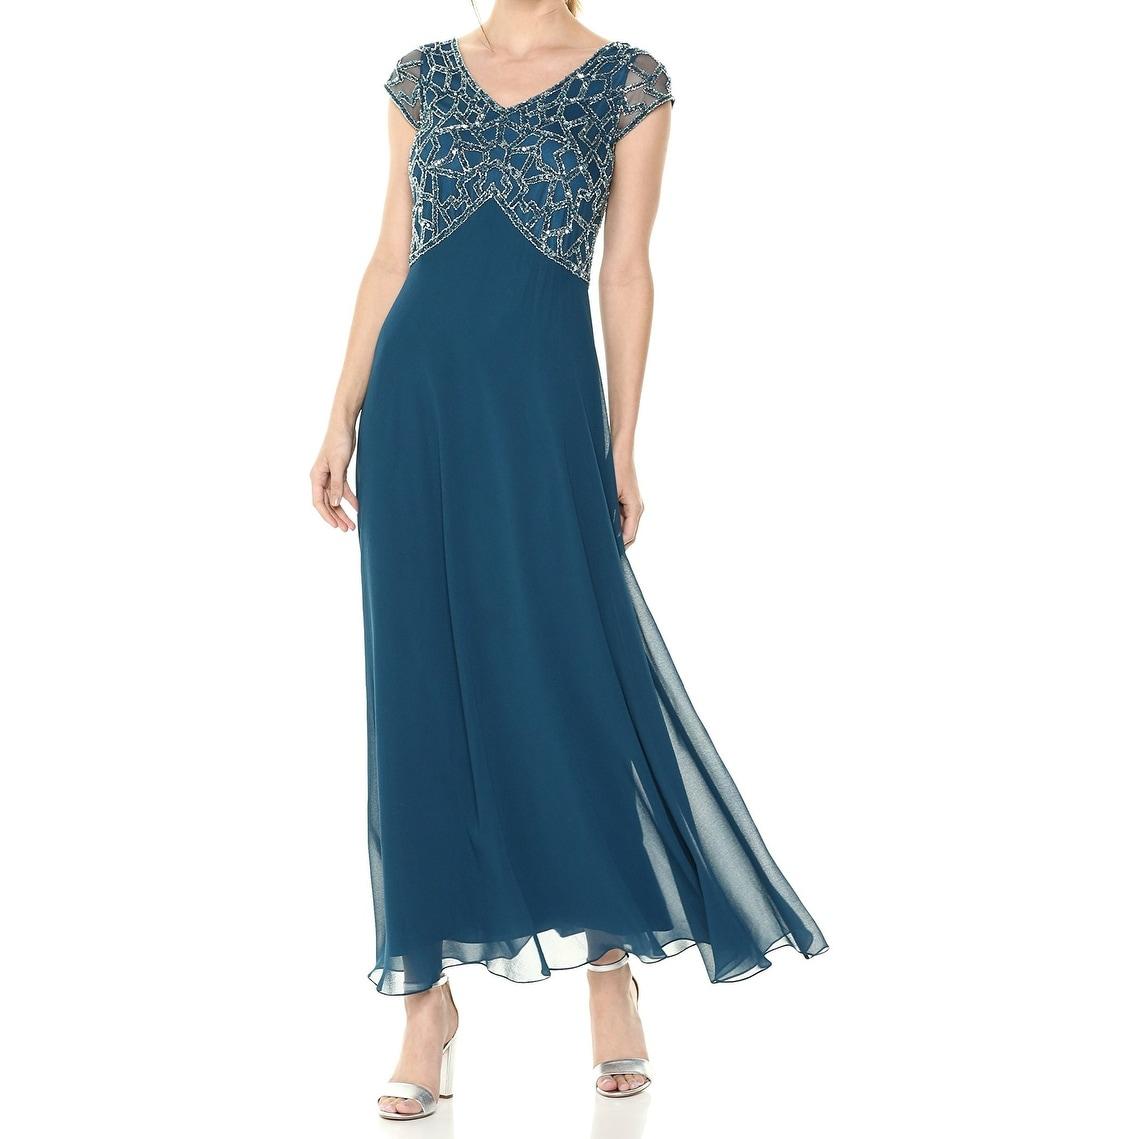 Shop J Kara Blue Teal Womens Size 12 Bead-Embellished Chiffon Gown ...